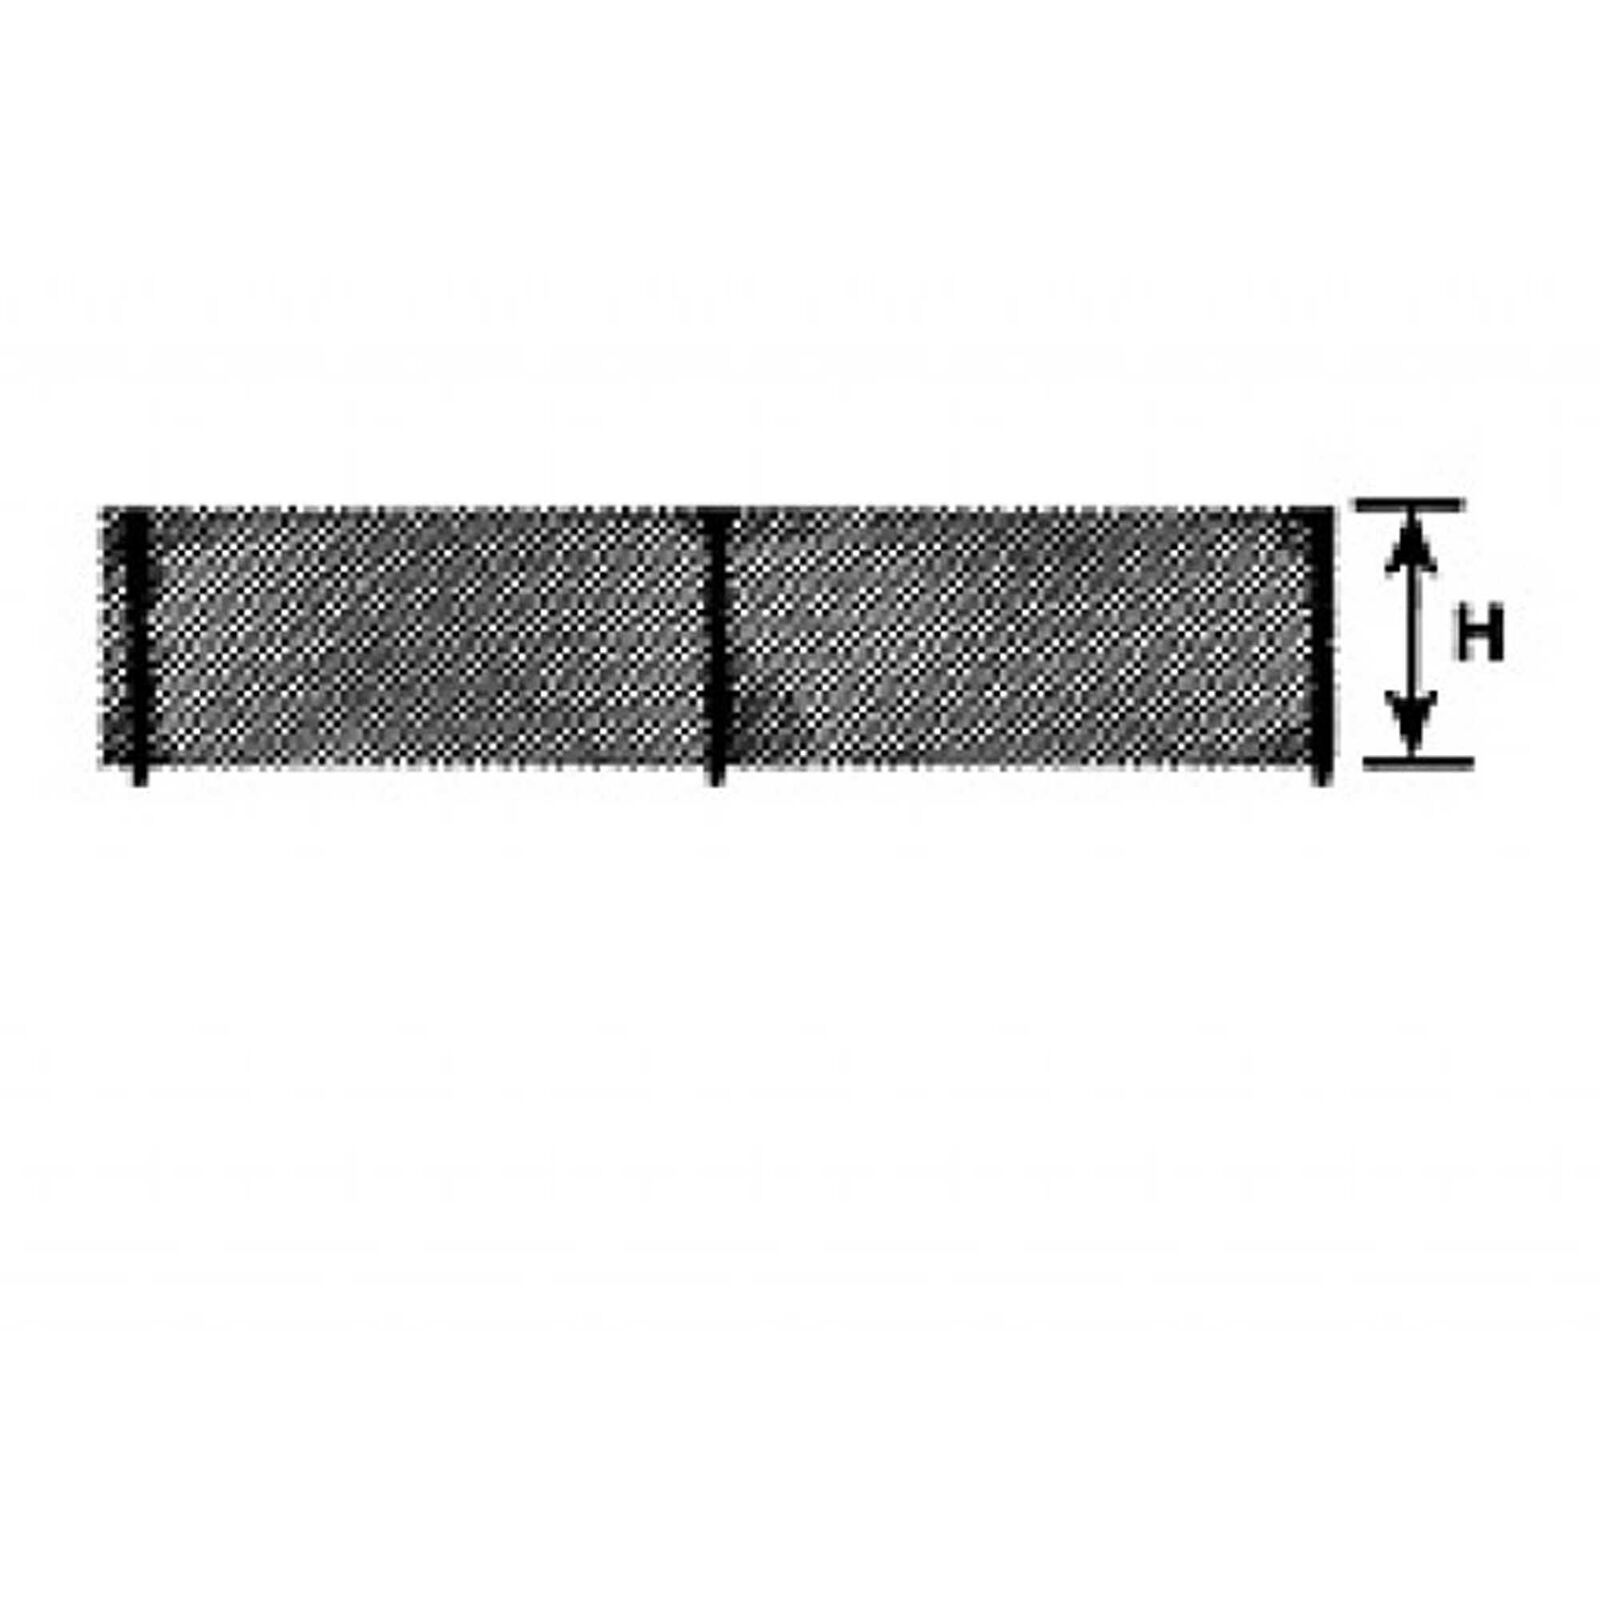 HO (1/100) Chain Link Fence